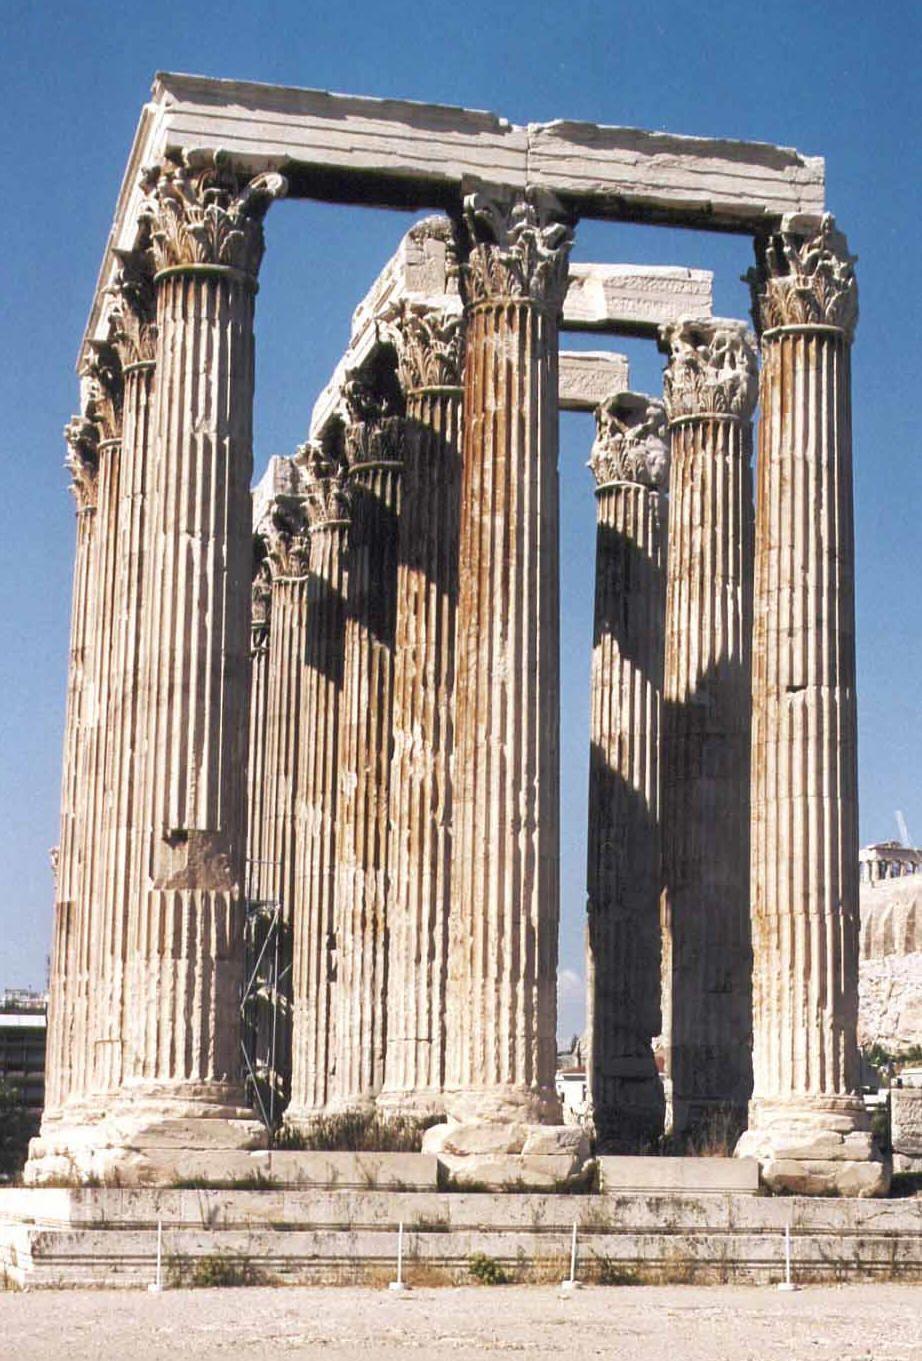 Iets Nieuws Romeinse bouwkunst   Project 14-15   Romeinen, Romeinse &FJ96